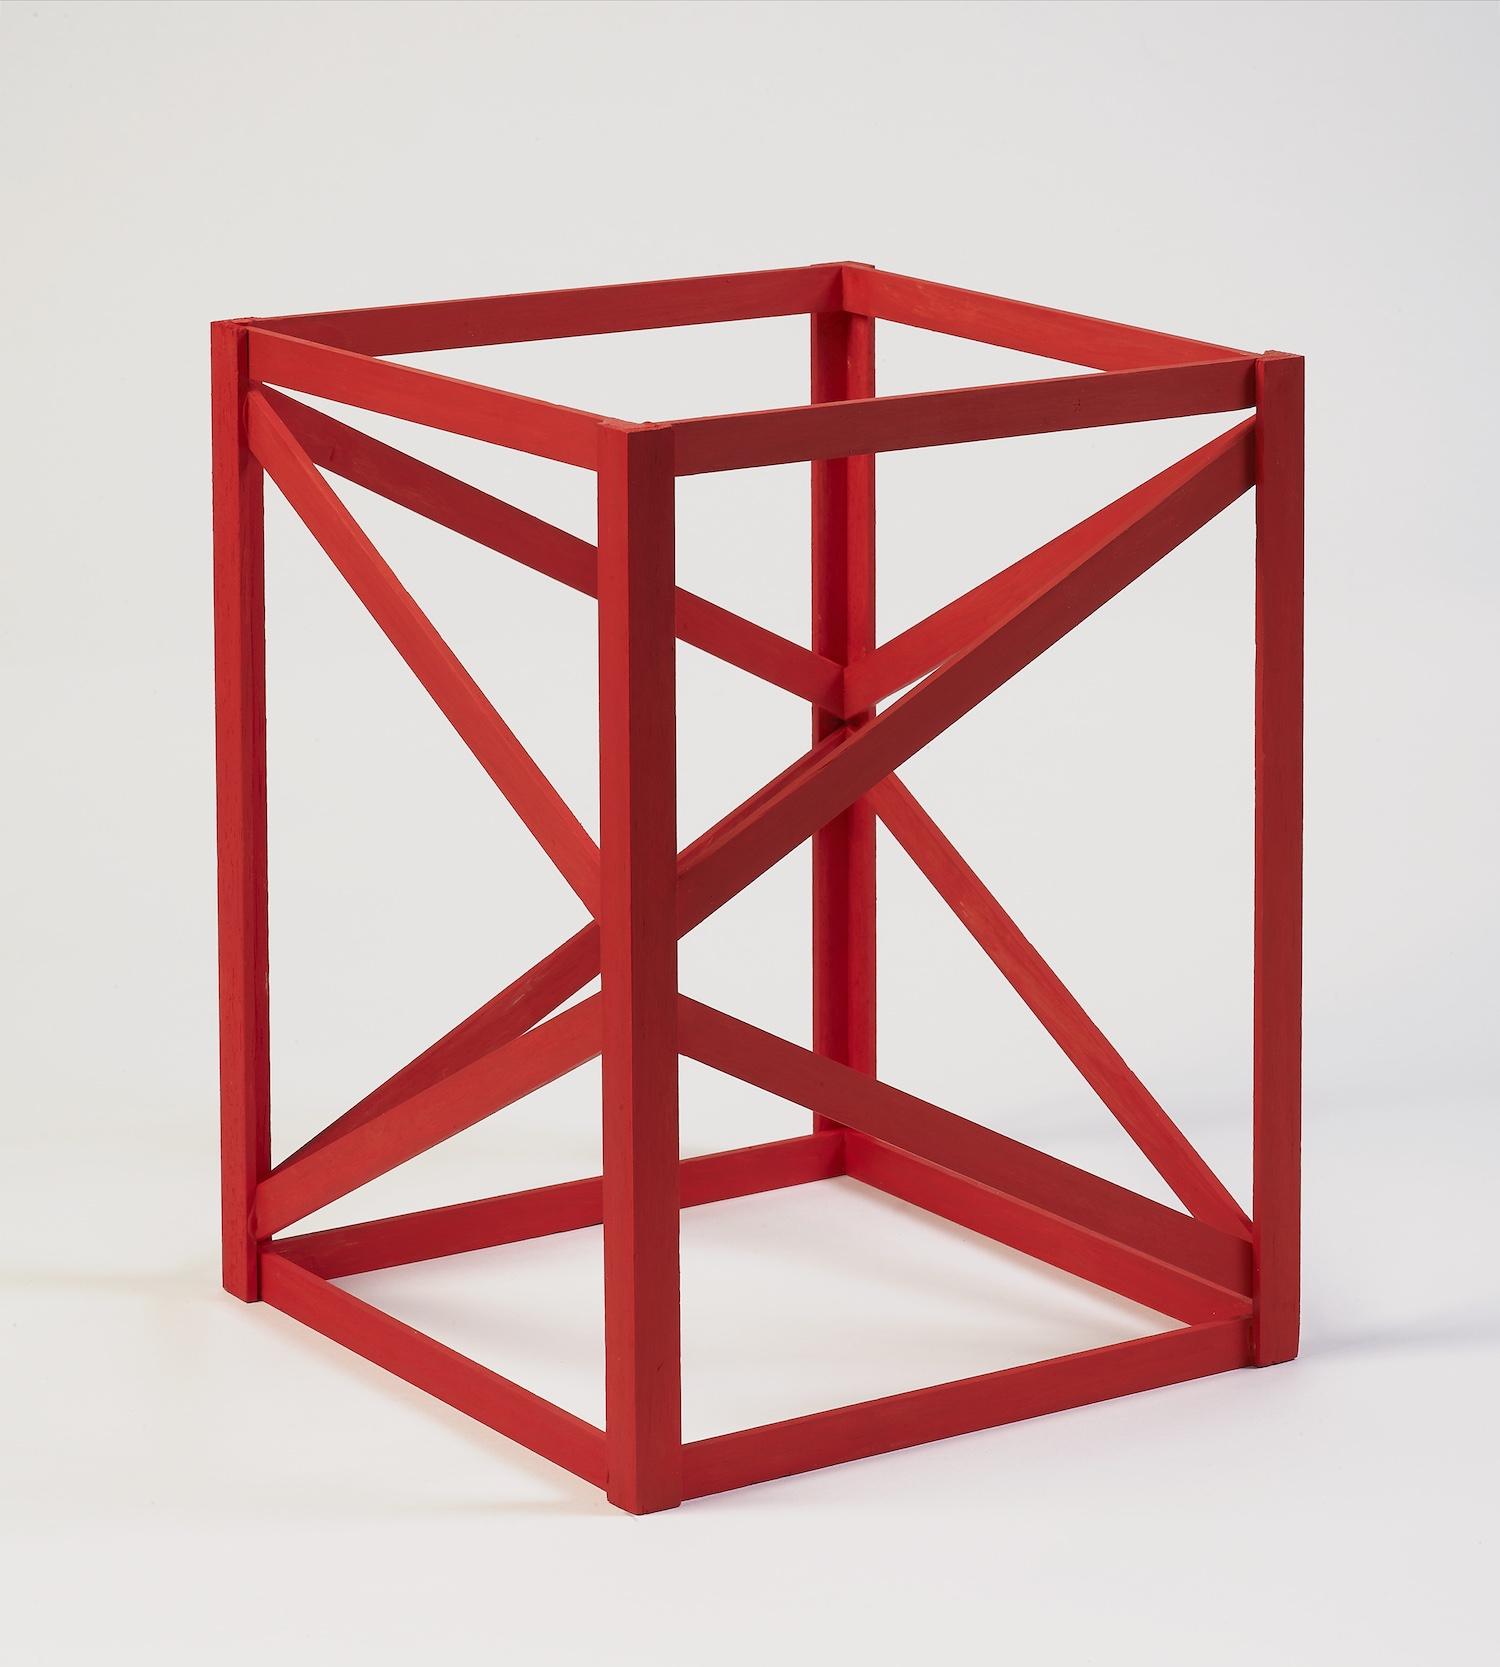 Rasheed Araeen, 'Multi Red', 1968/2018, acrylic on wood, 30.6 x 23 x 23 cm. Image courtesy of Asia Art Archive.